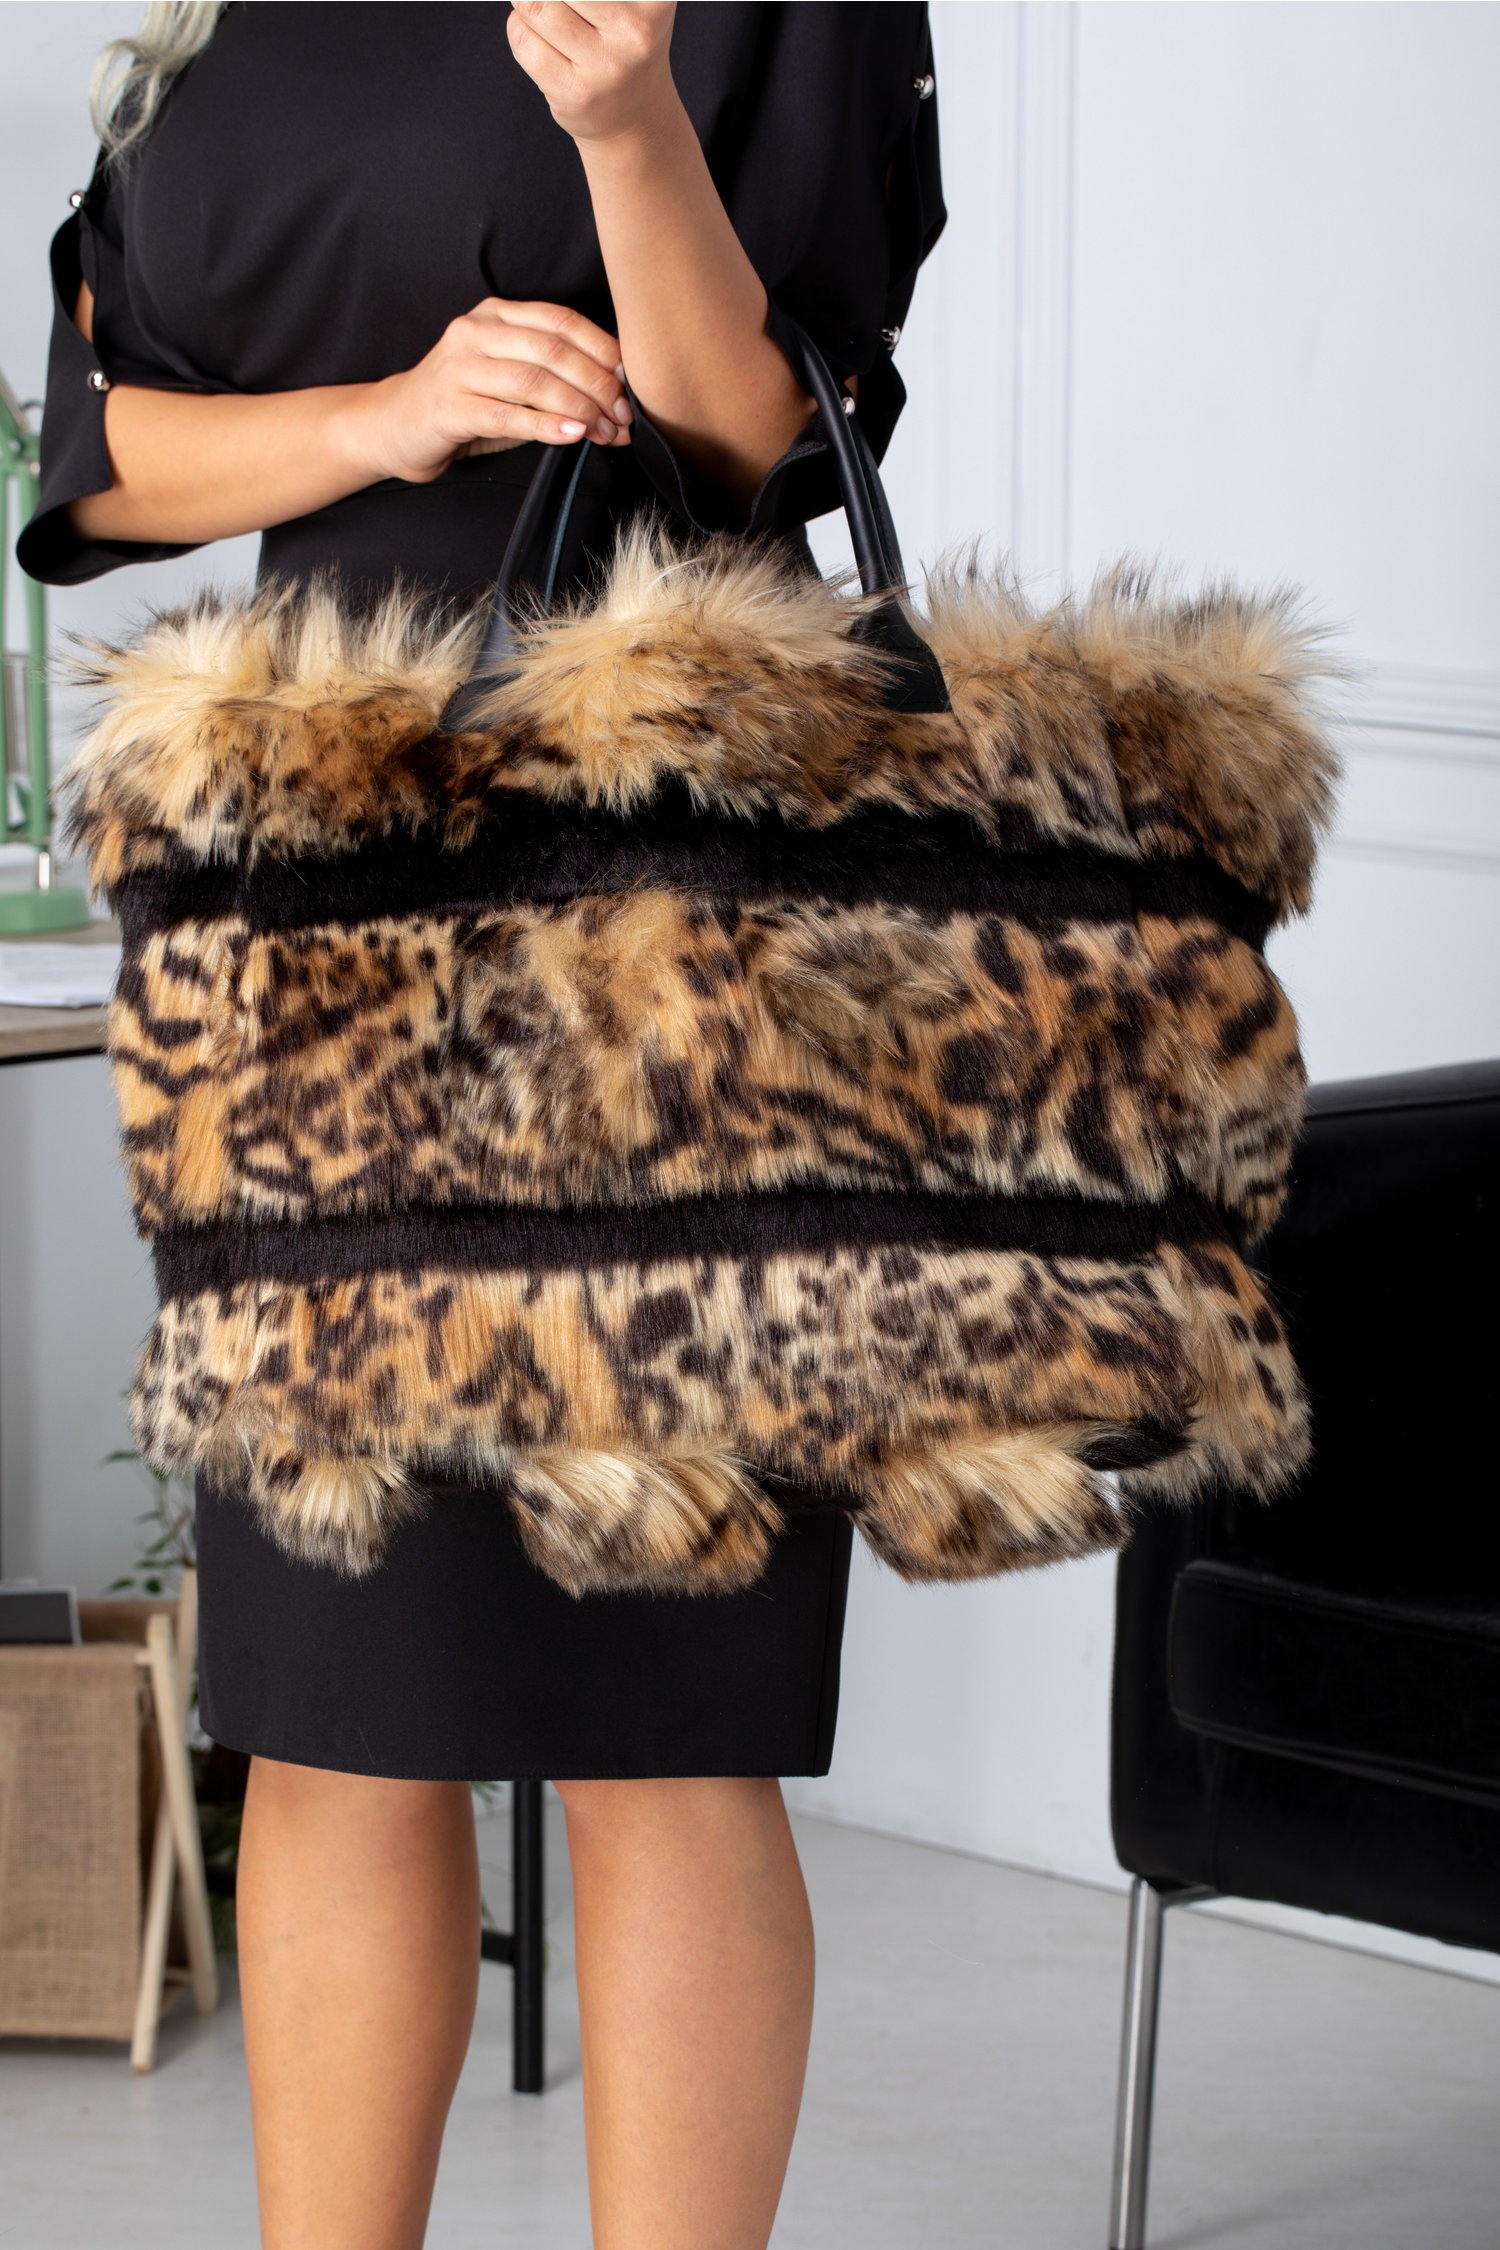 Geanta Kitty Maxi Cu Insertii Dungi Negre Si Animal Print Maro Leopard